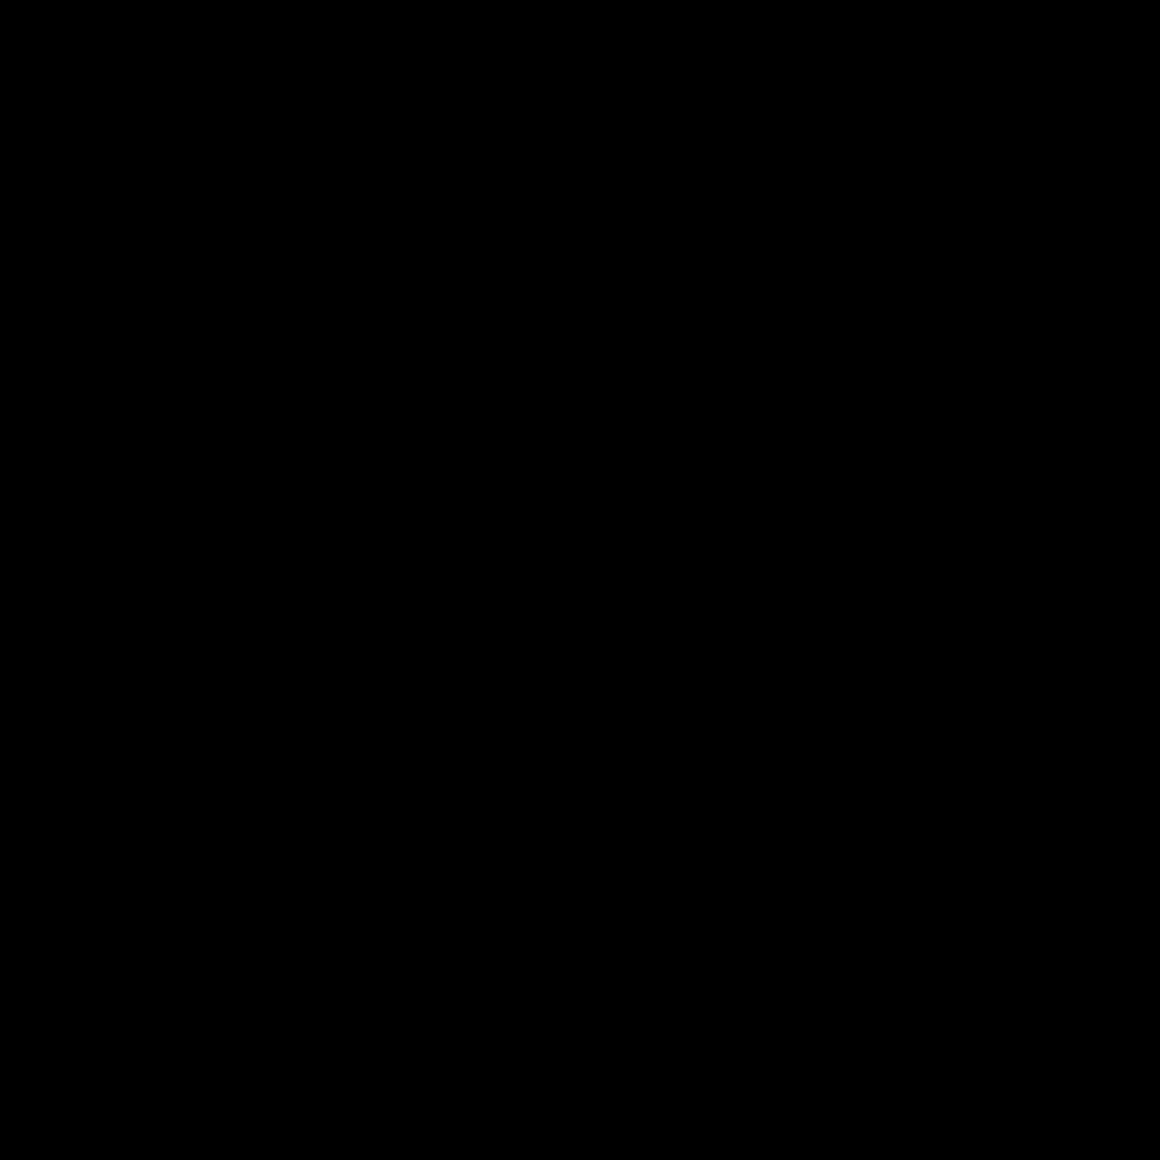 House of Worship Icon